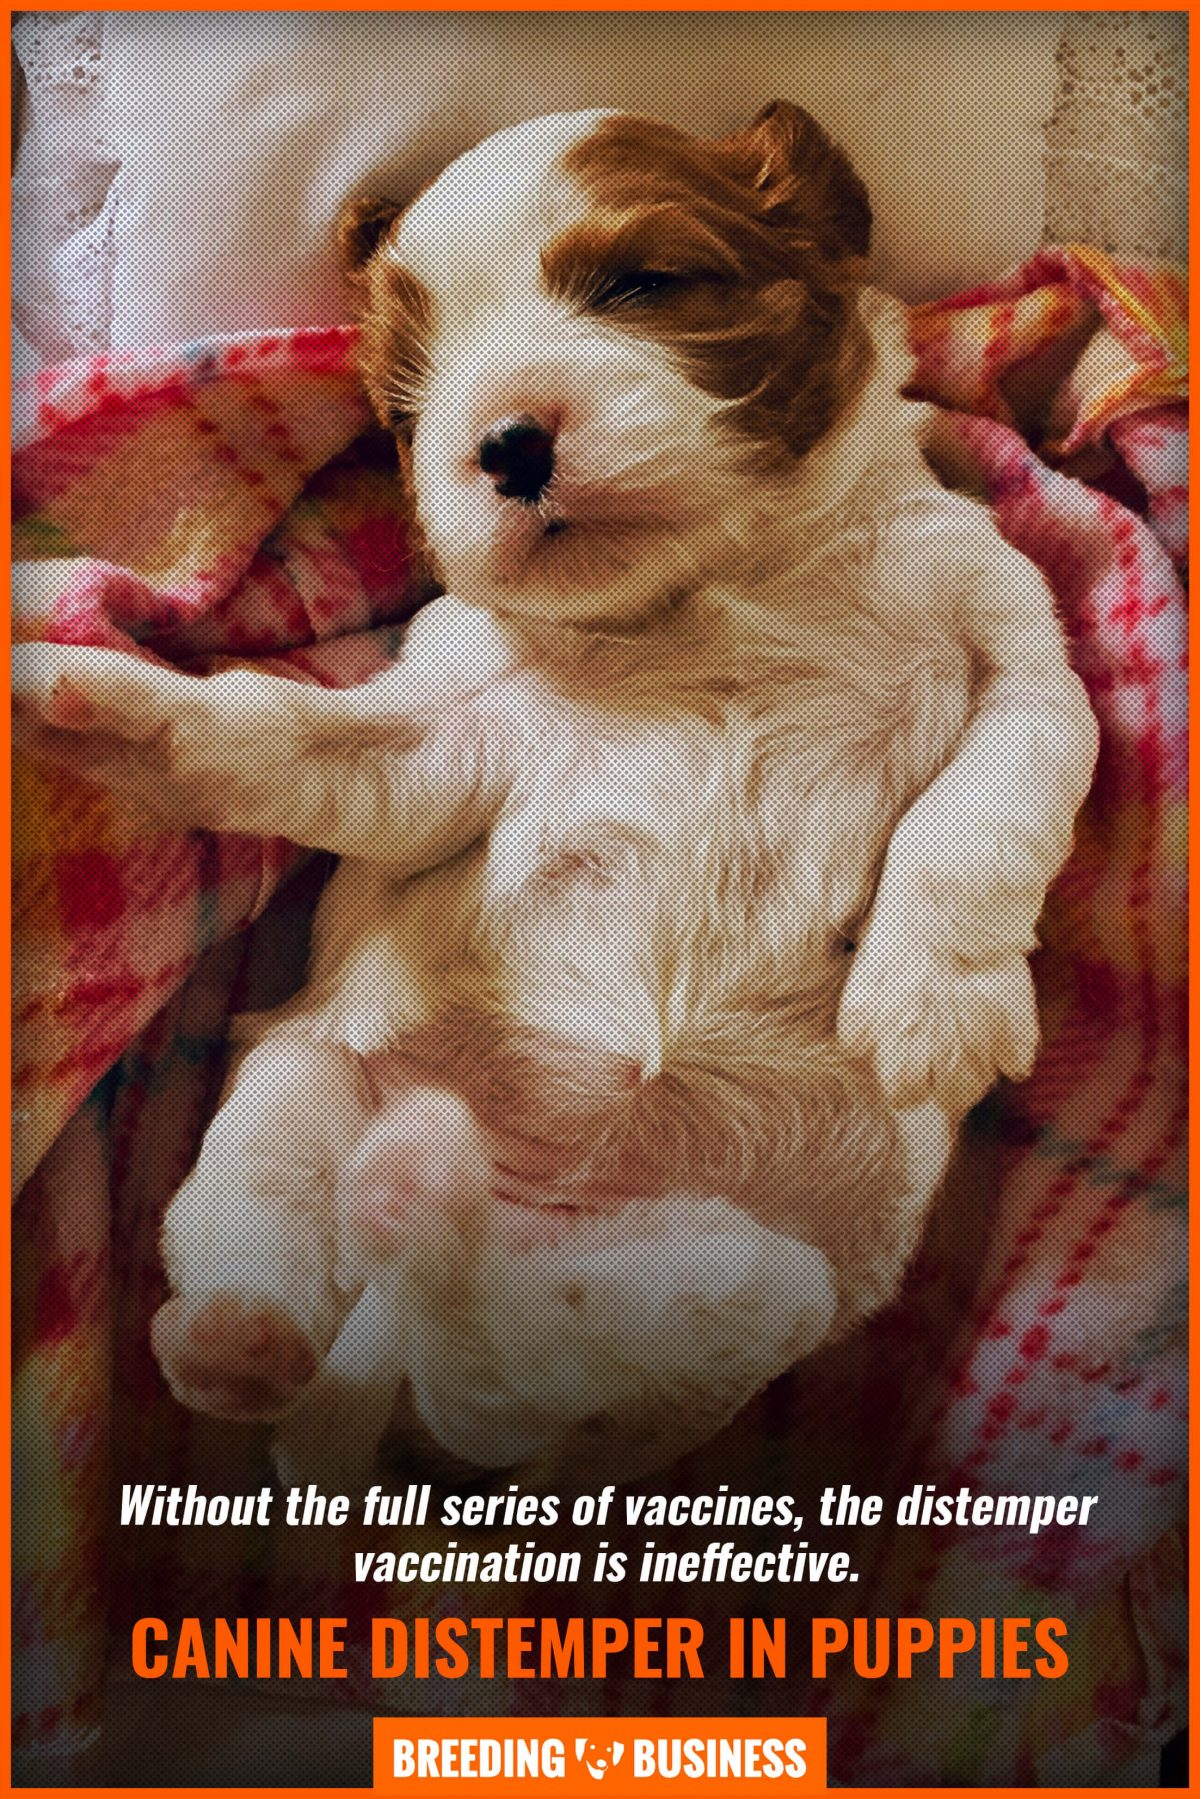 canine distemper in puppies